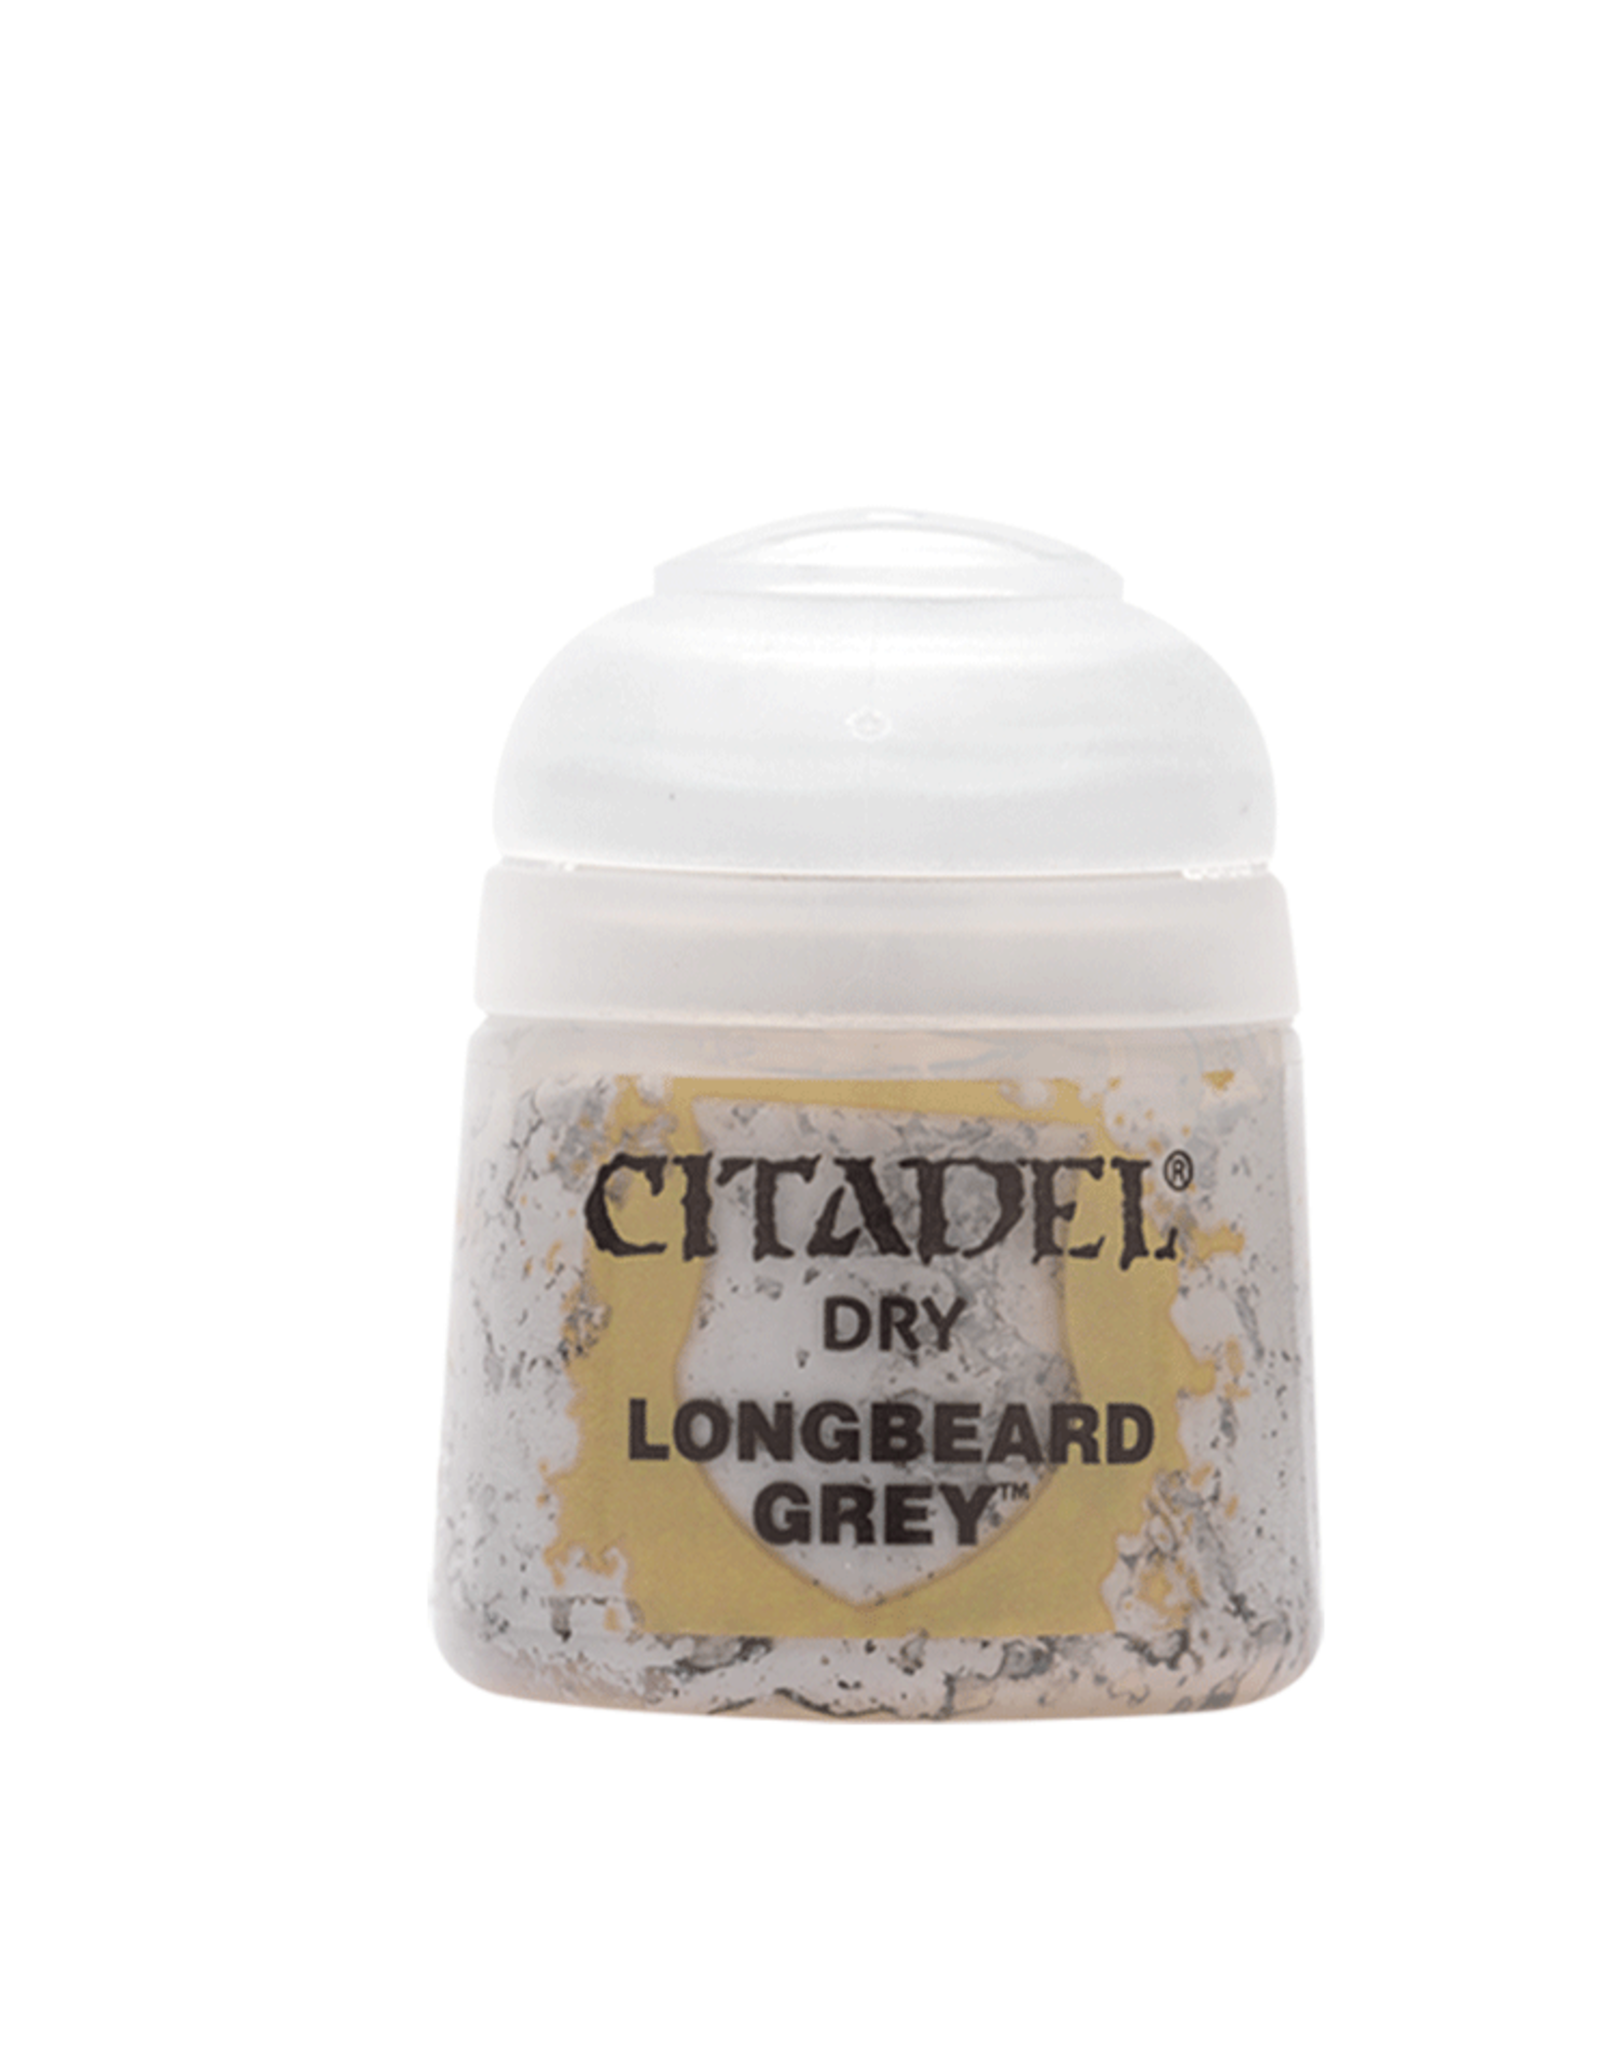 Games Workshop Citadel Dry: Longbeard Grey